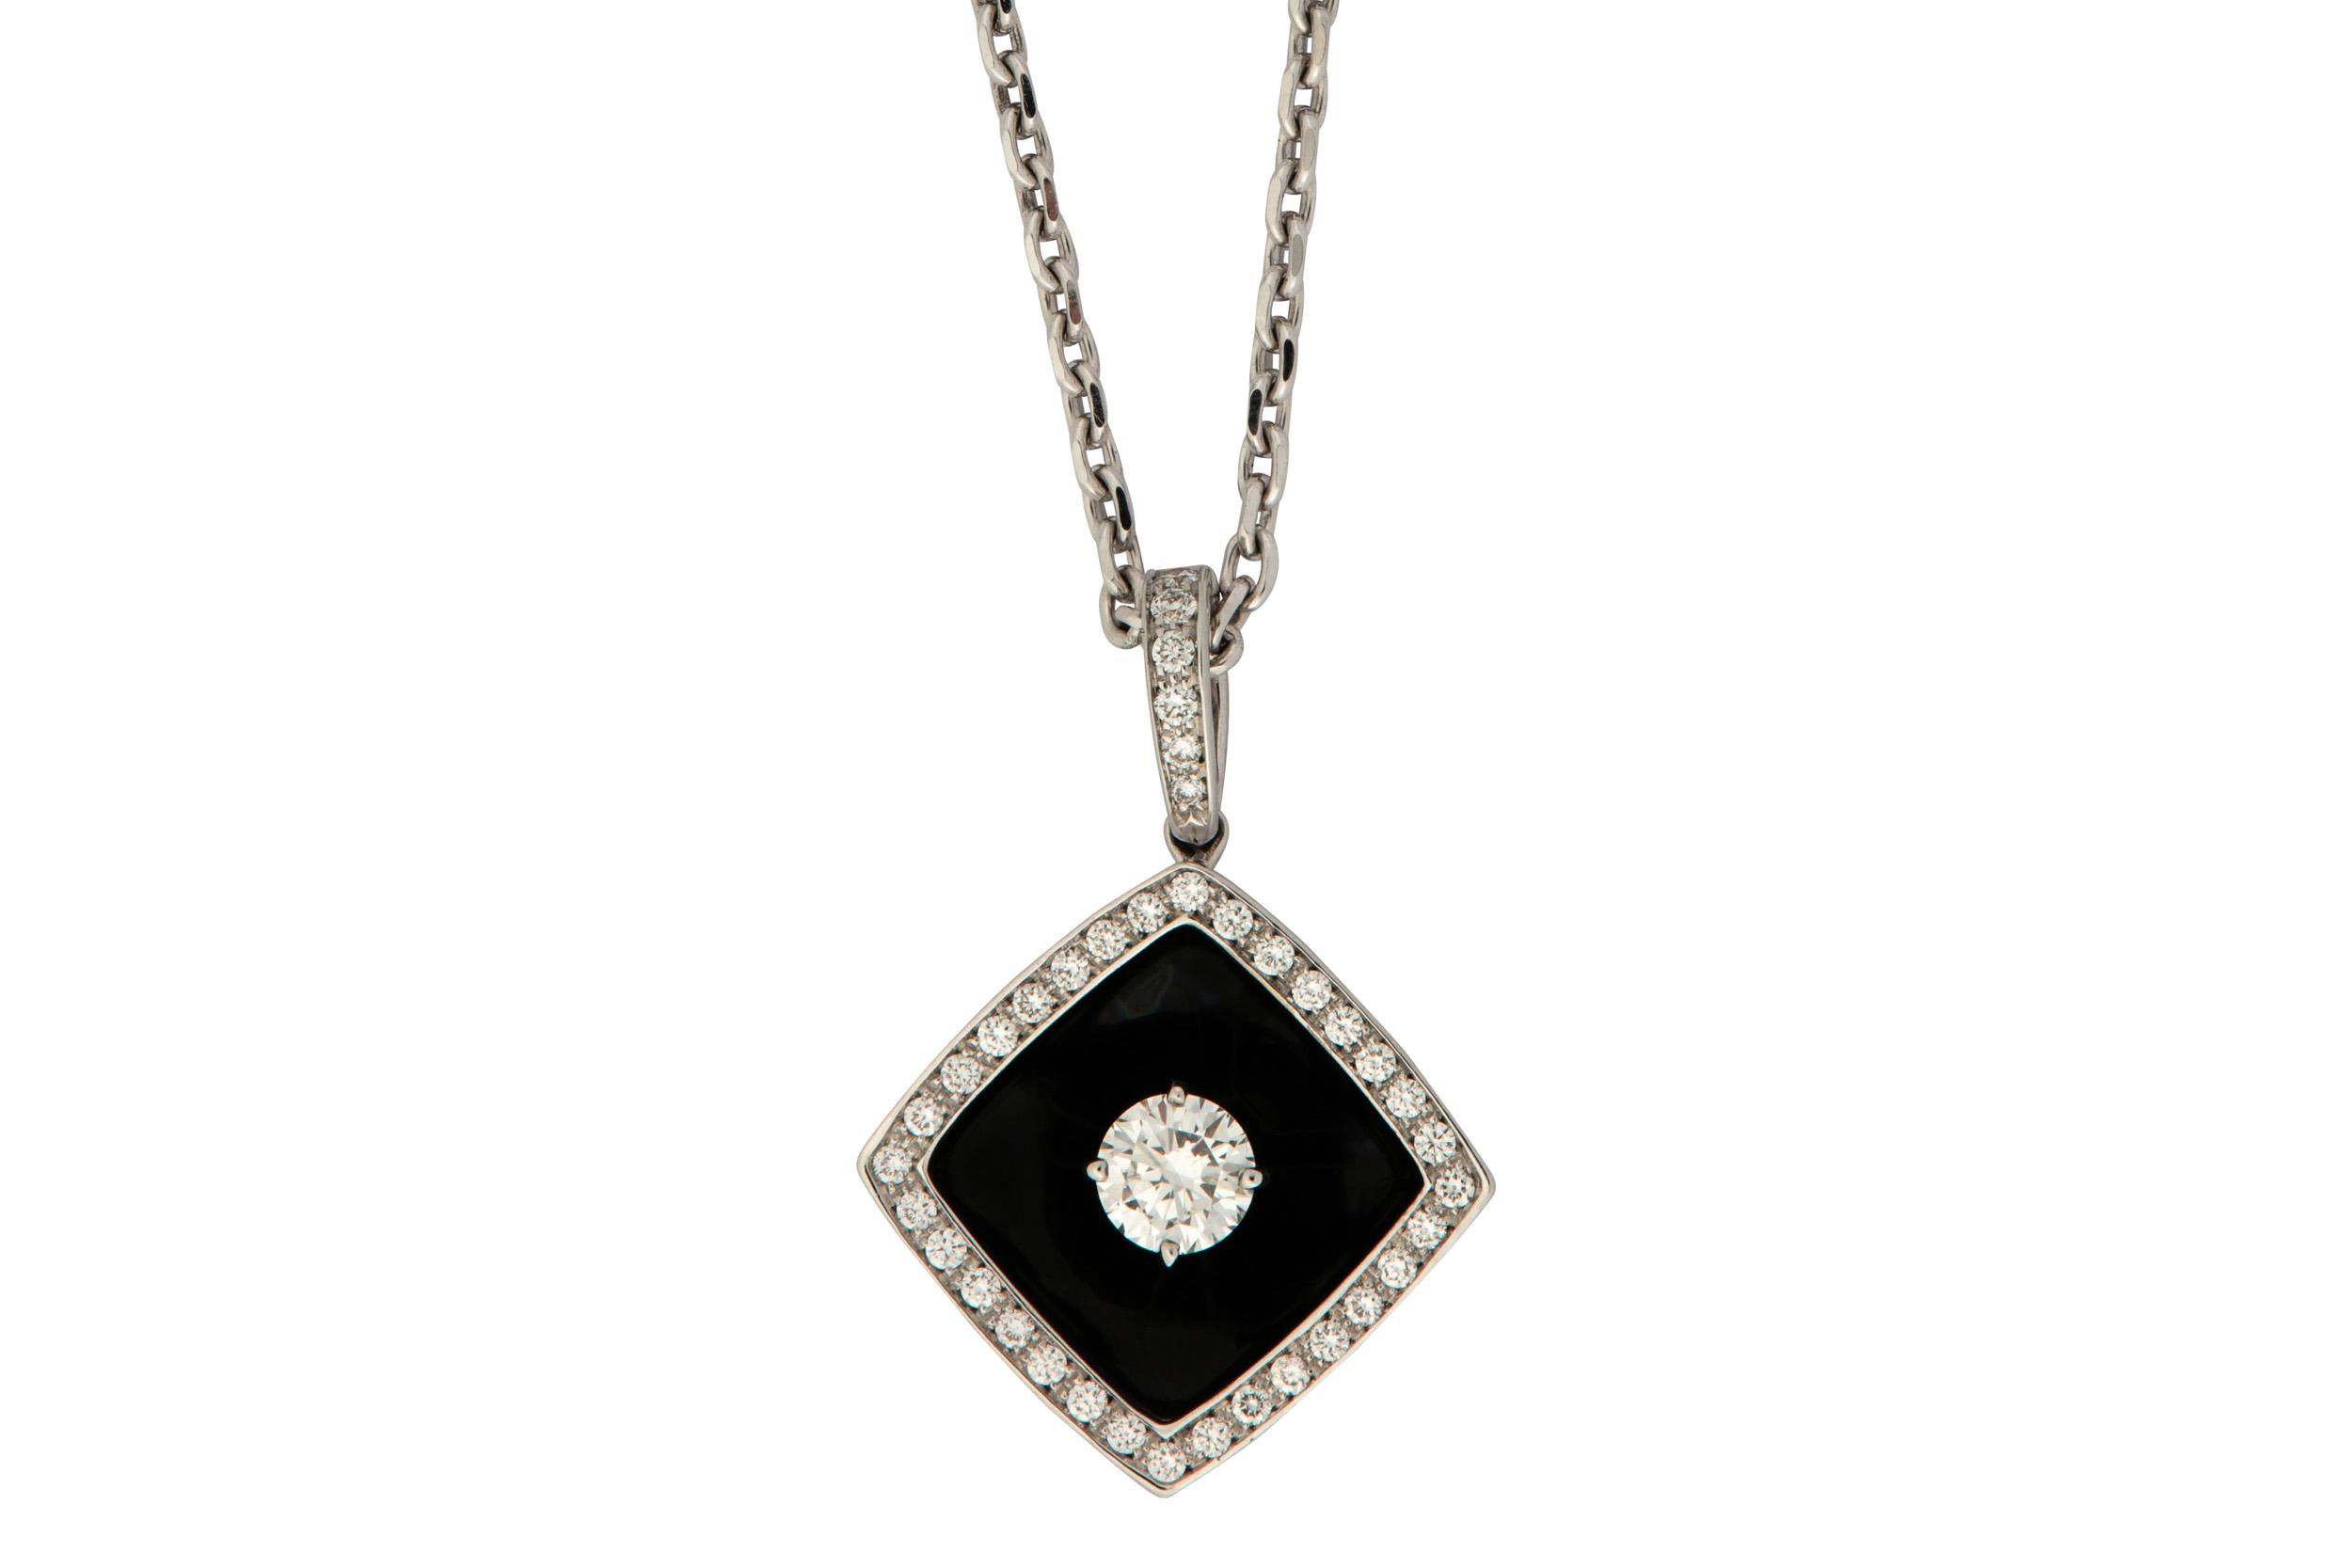 Lot 6 - An enamel and diamond 'Nuit Noire' pendant necklace, by Chanel